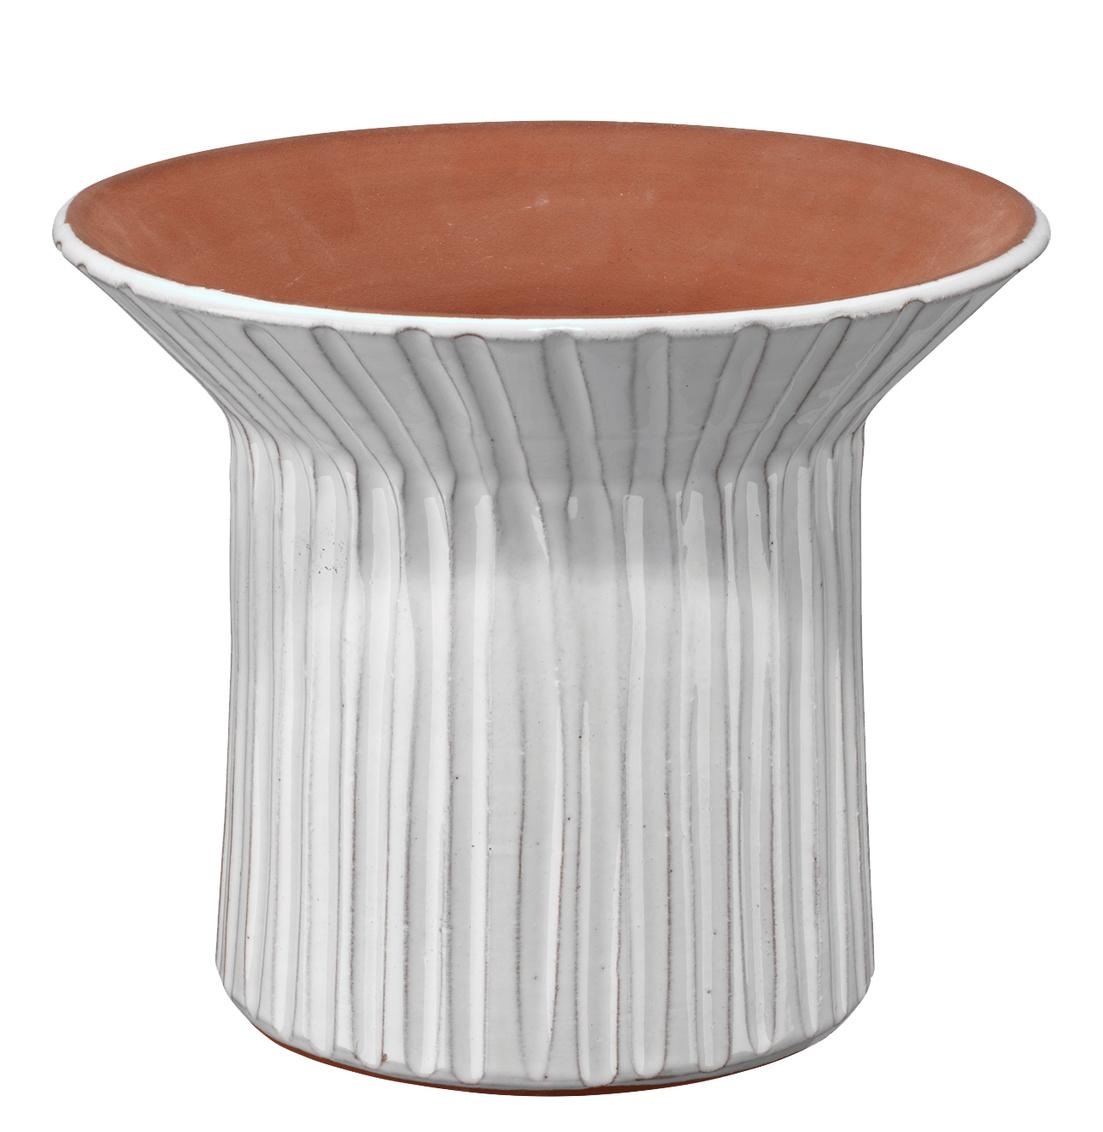 7podi wdcr widepodiumvessel cream%20copy